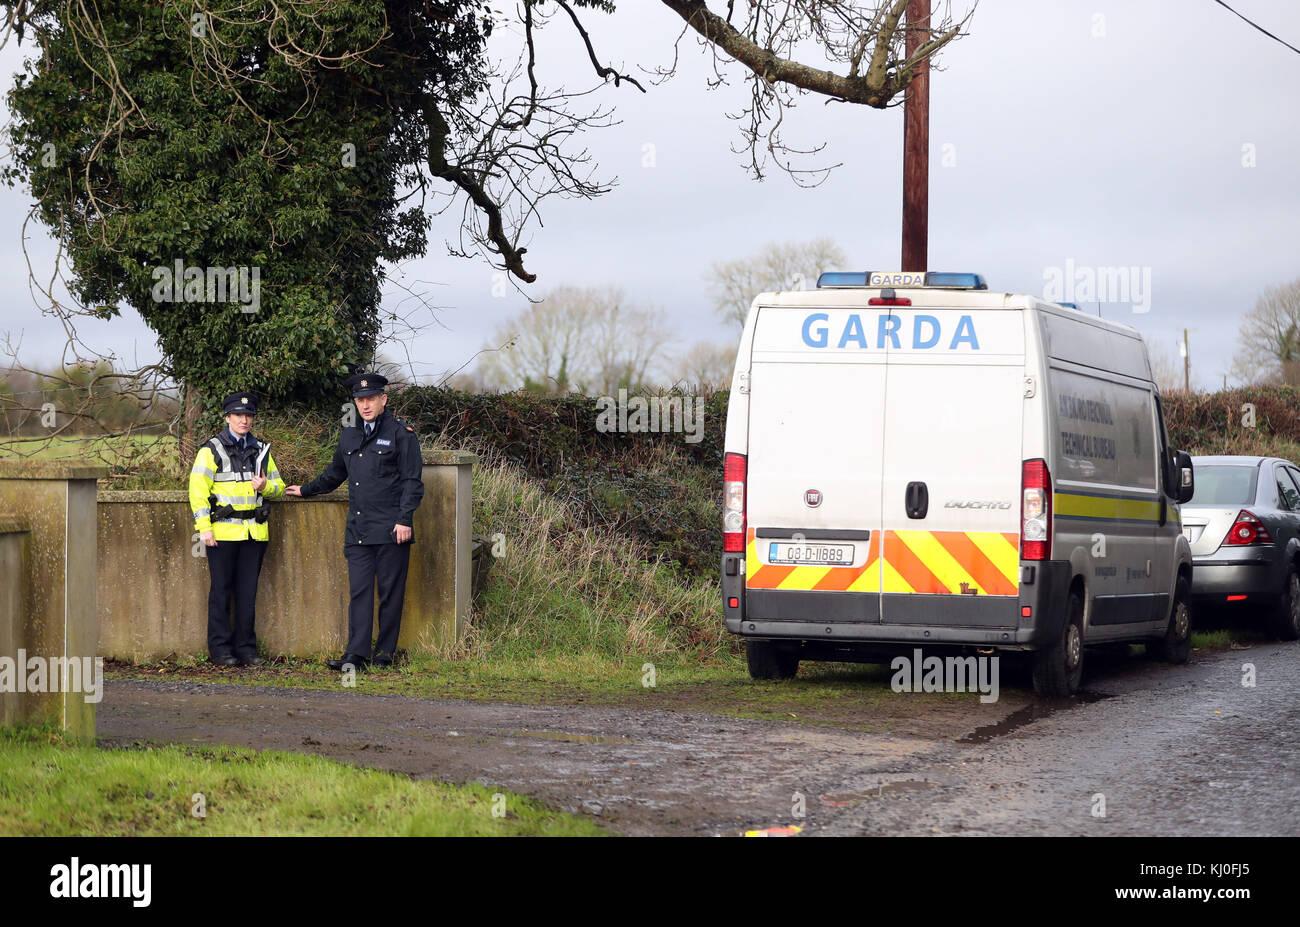 Ciara Phelan column: Why the dating scene for - Irish Mirror